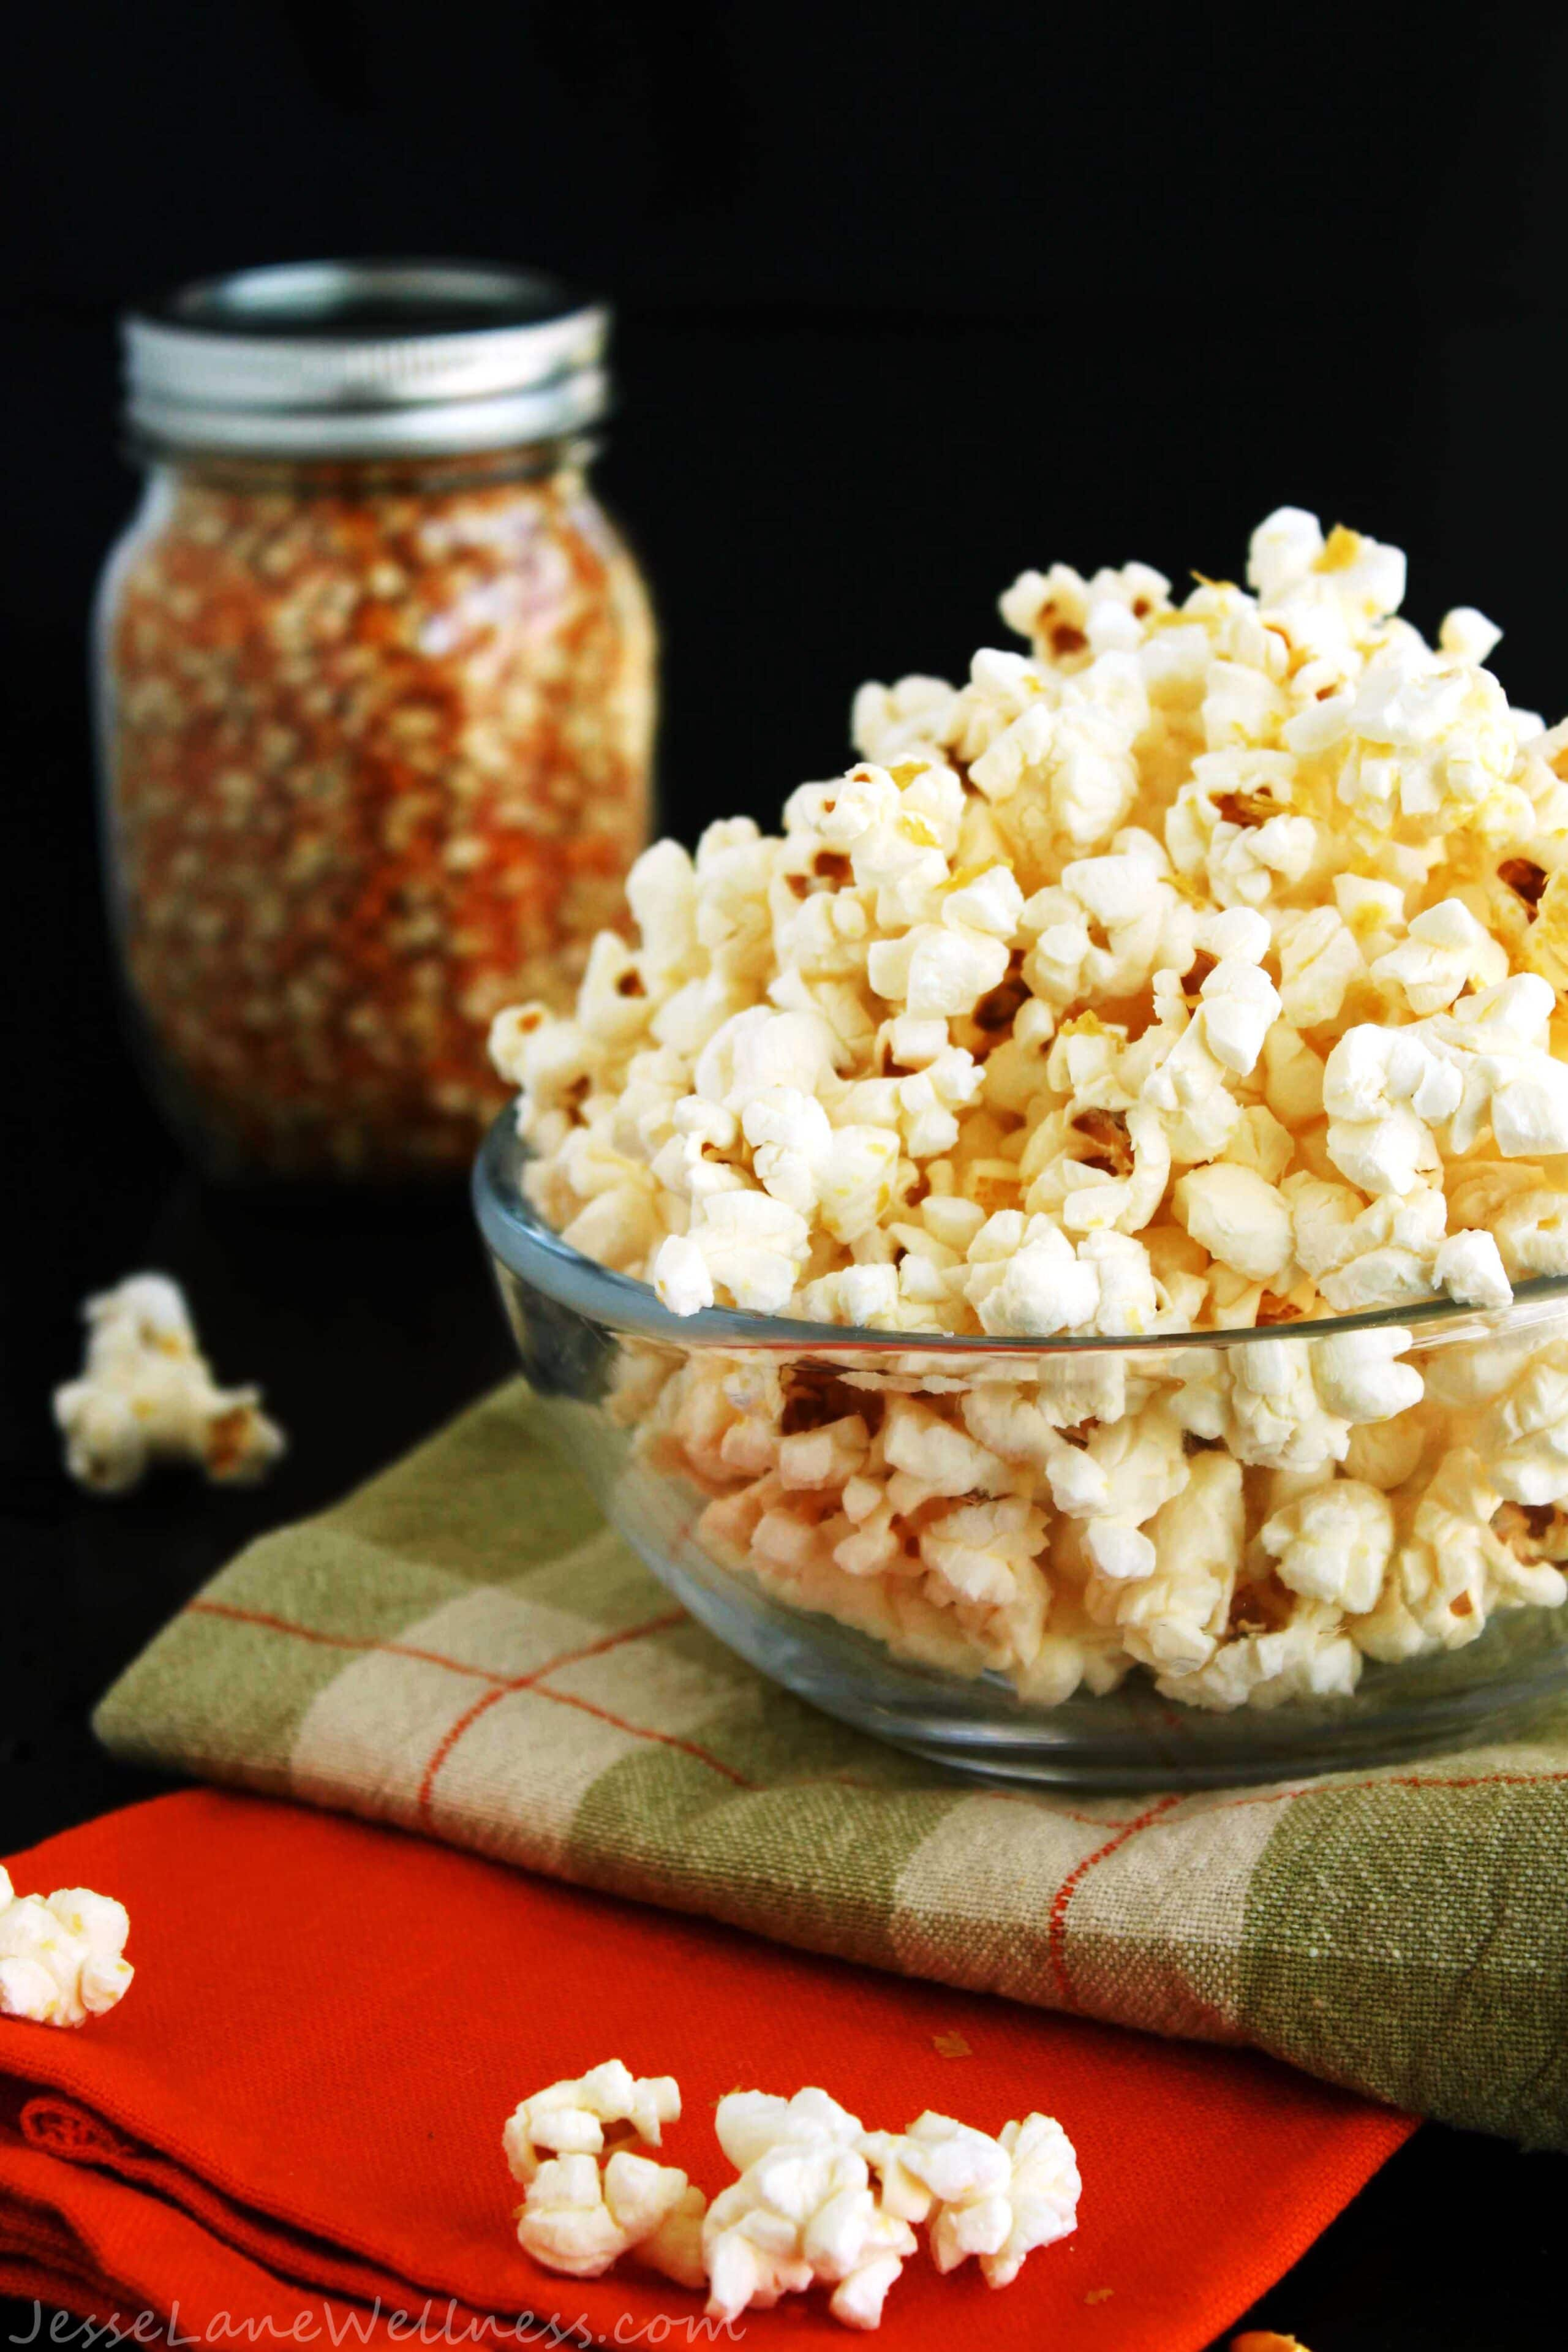 Cheesy Popcorn by @JesseLWellness #vegan #popcorn